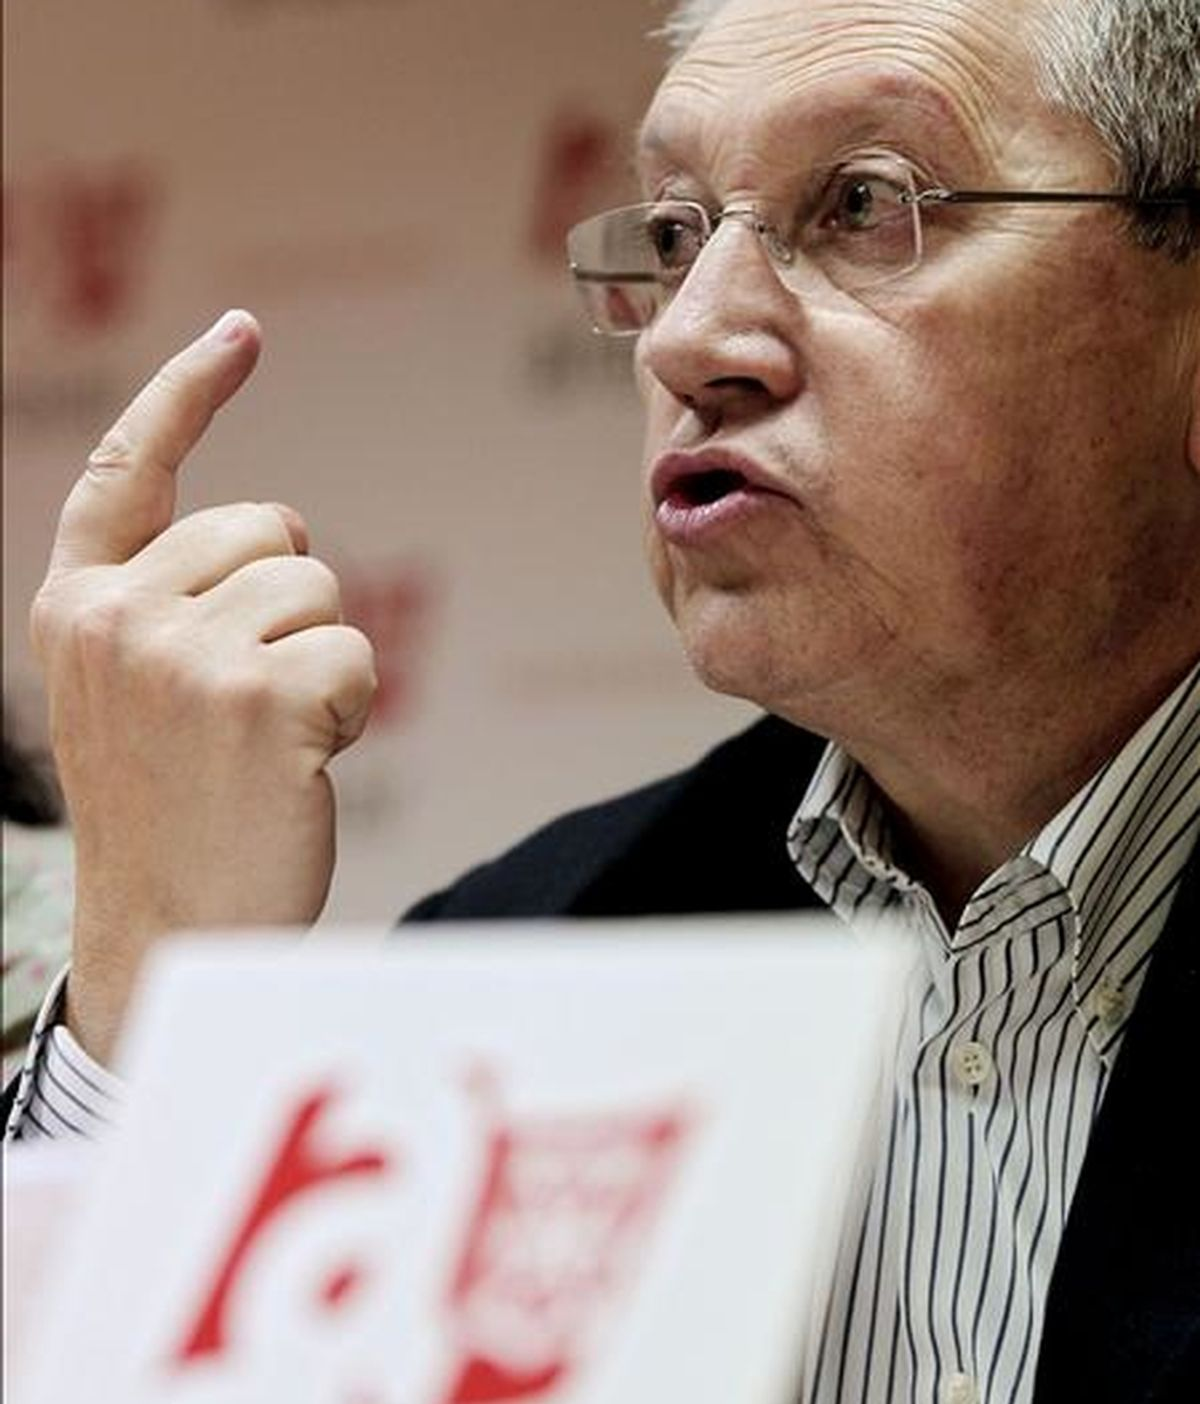 El coordinador de Aralar, Patxi Zabaleta. EFE/Archivo